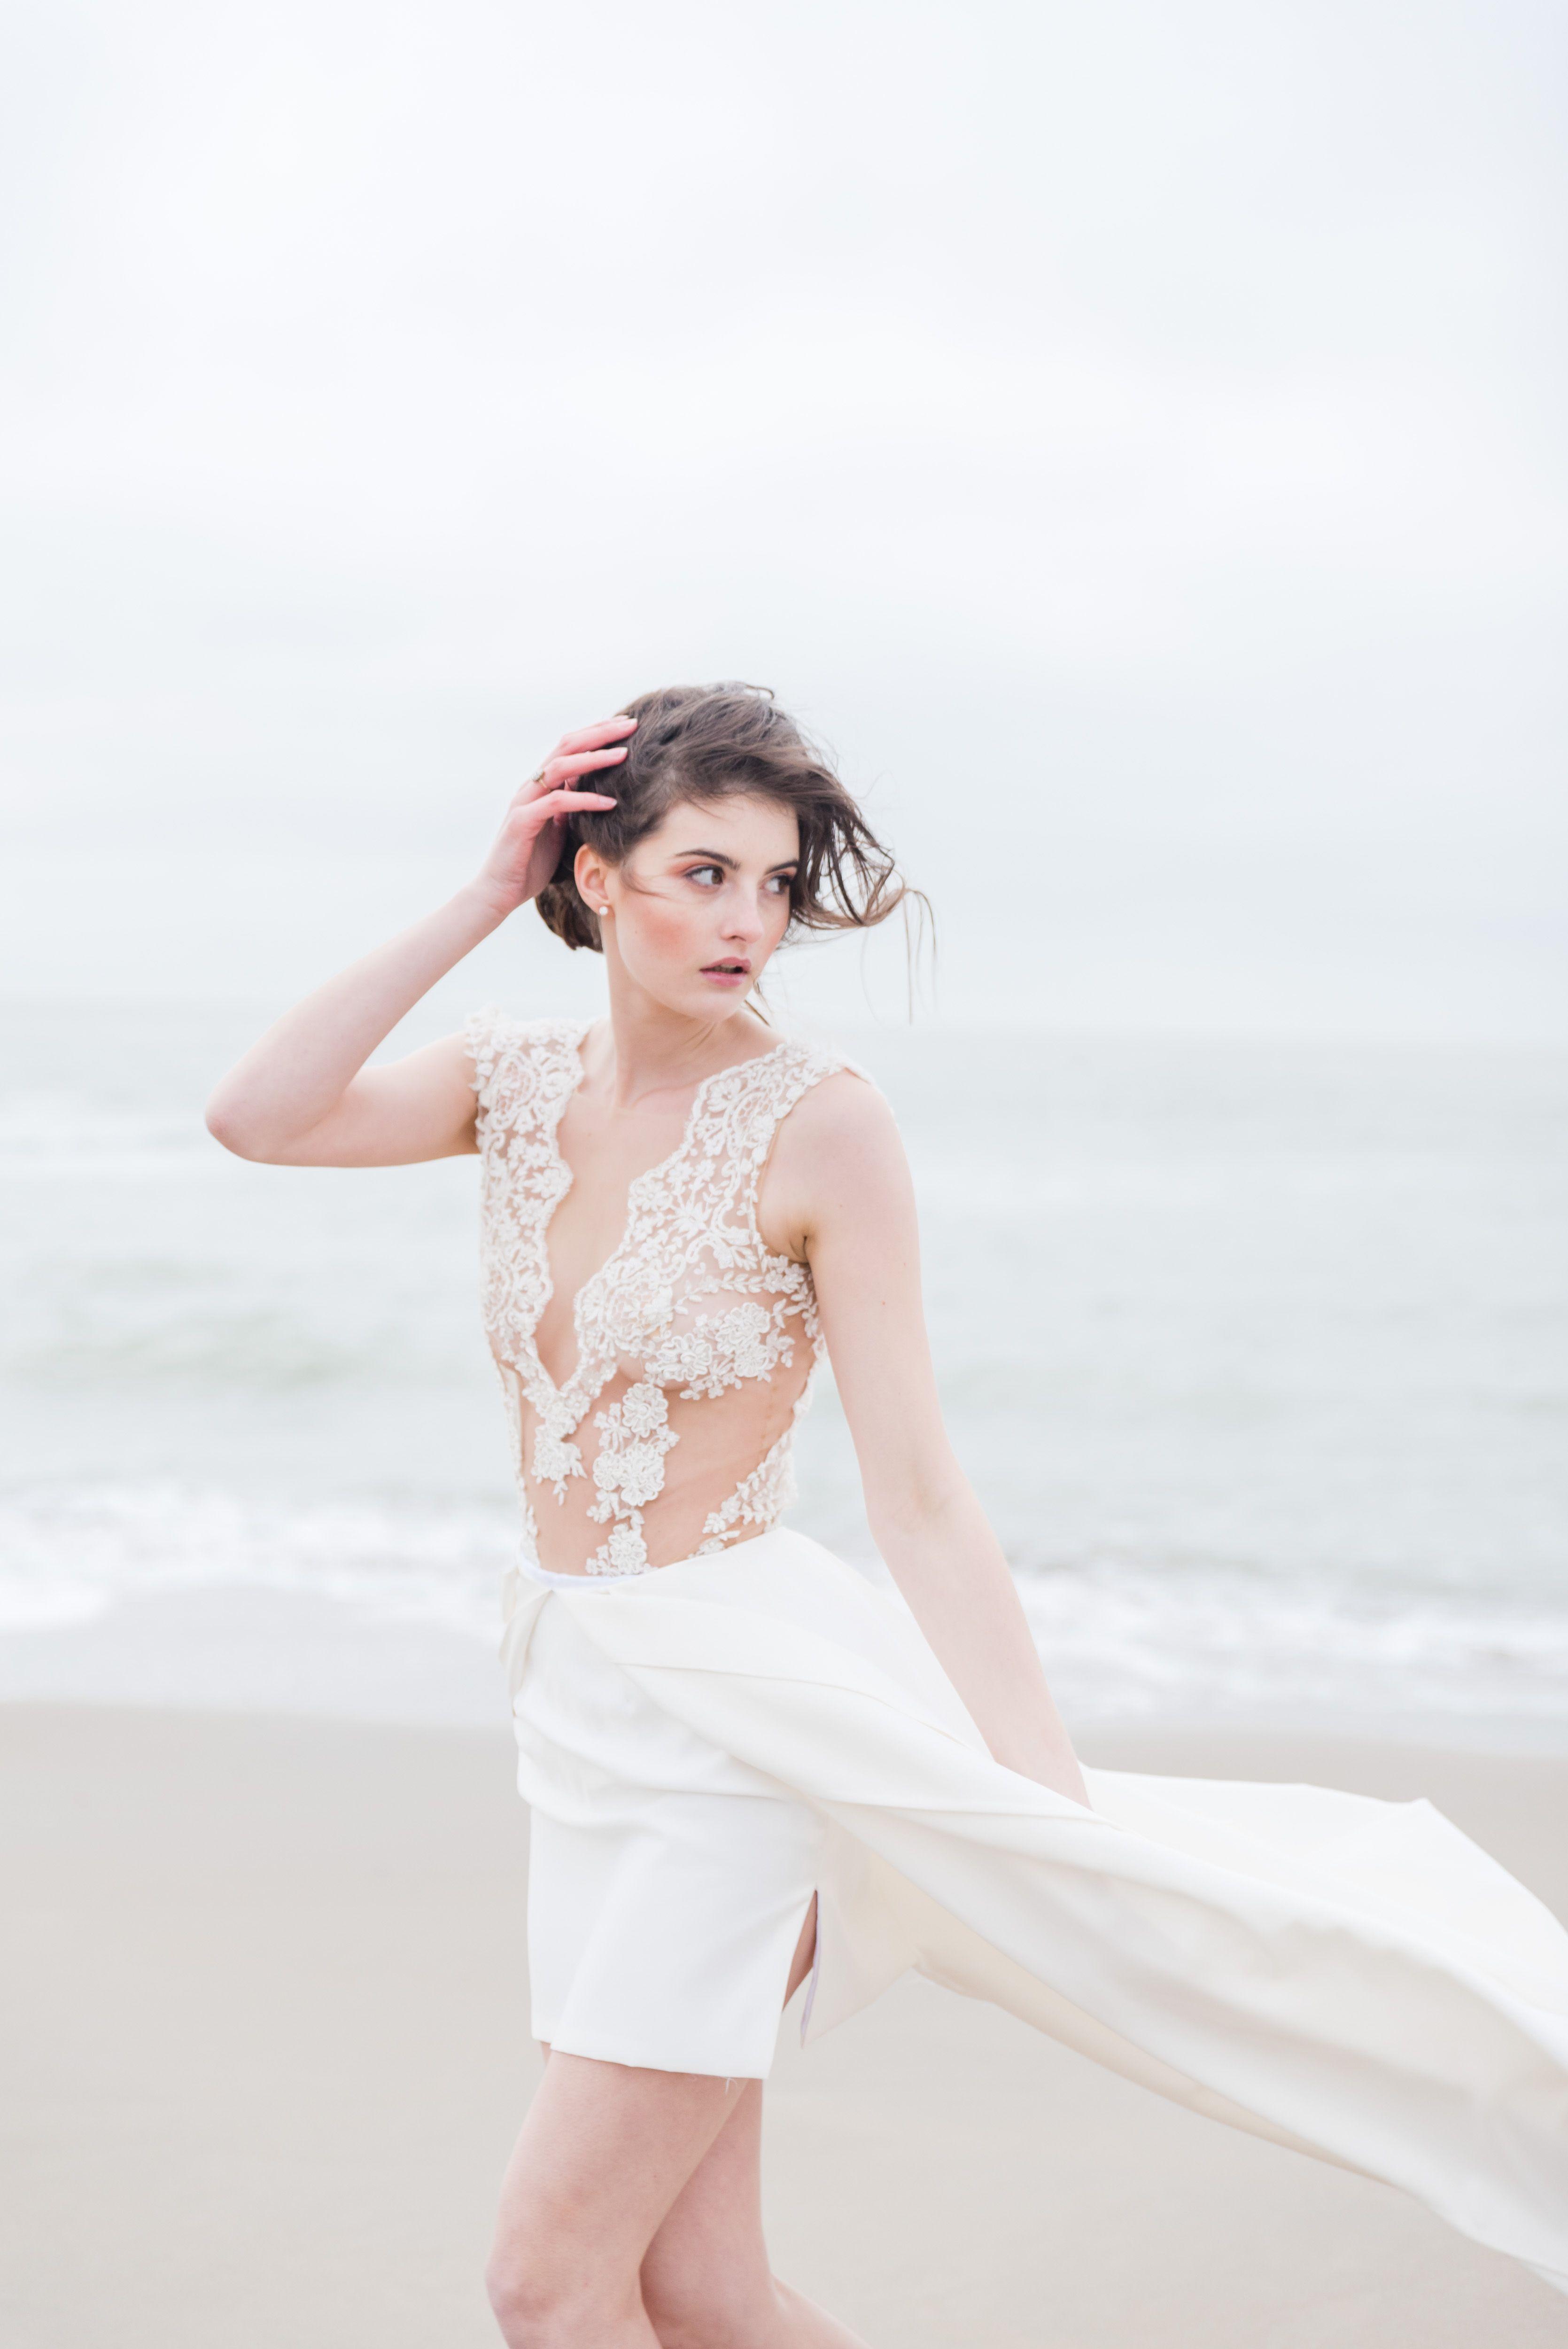 EMANUEL HENDRIK | Body: Sparkle - Rock: Tailor | Model: Johanna ...